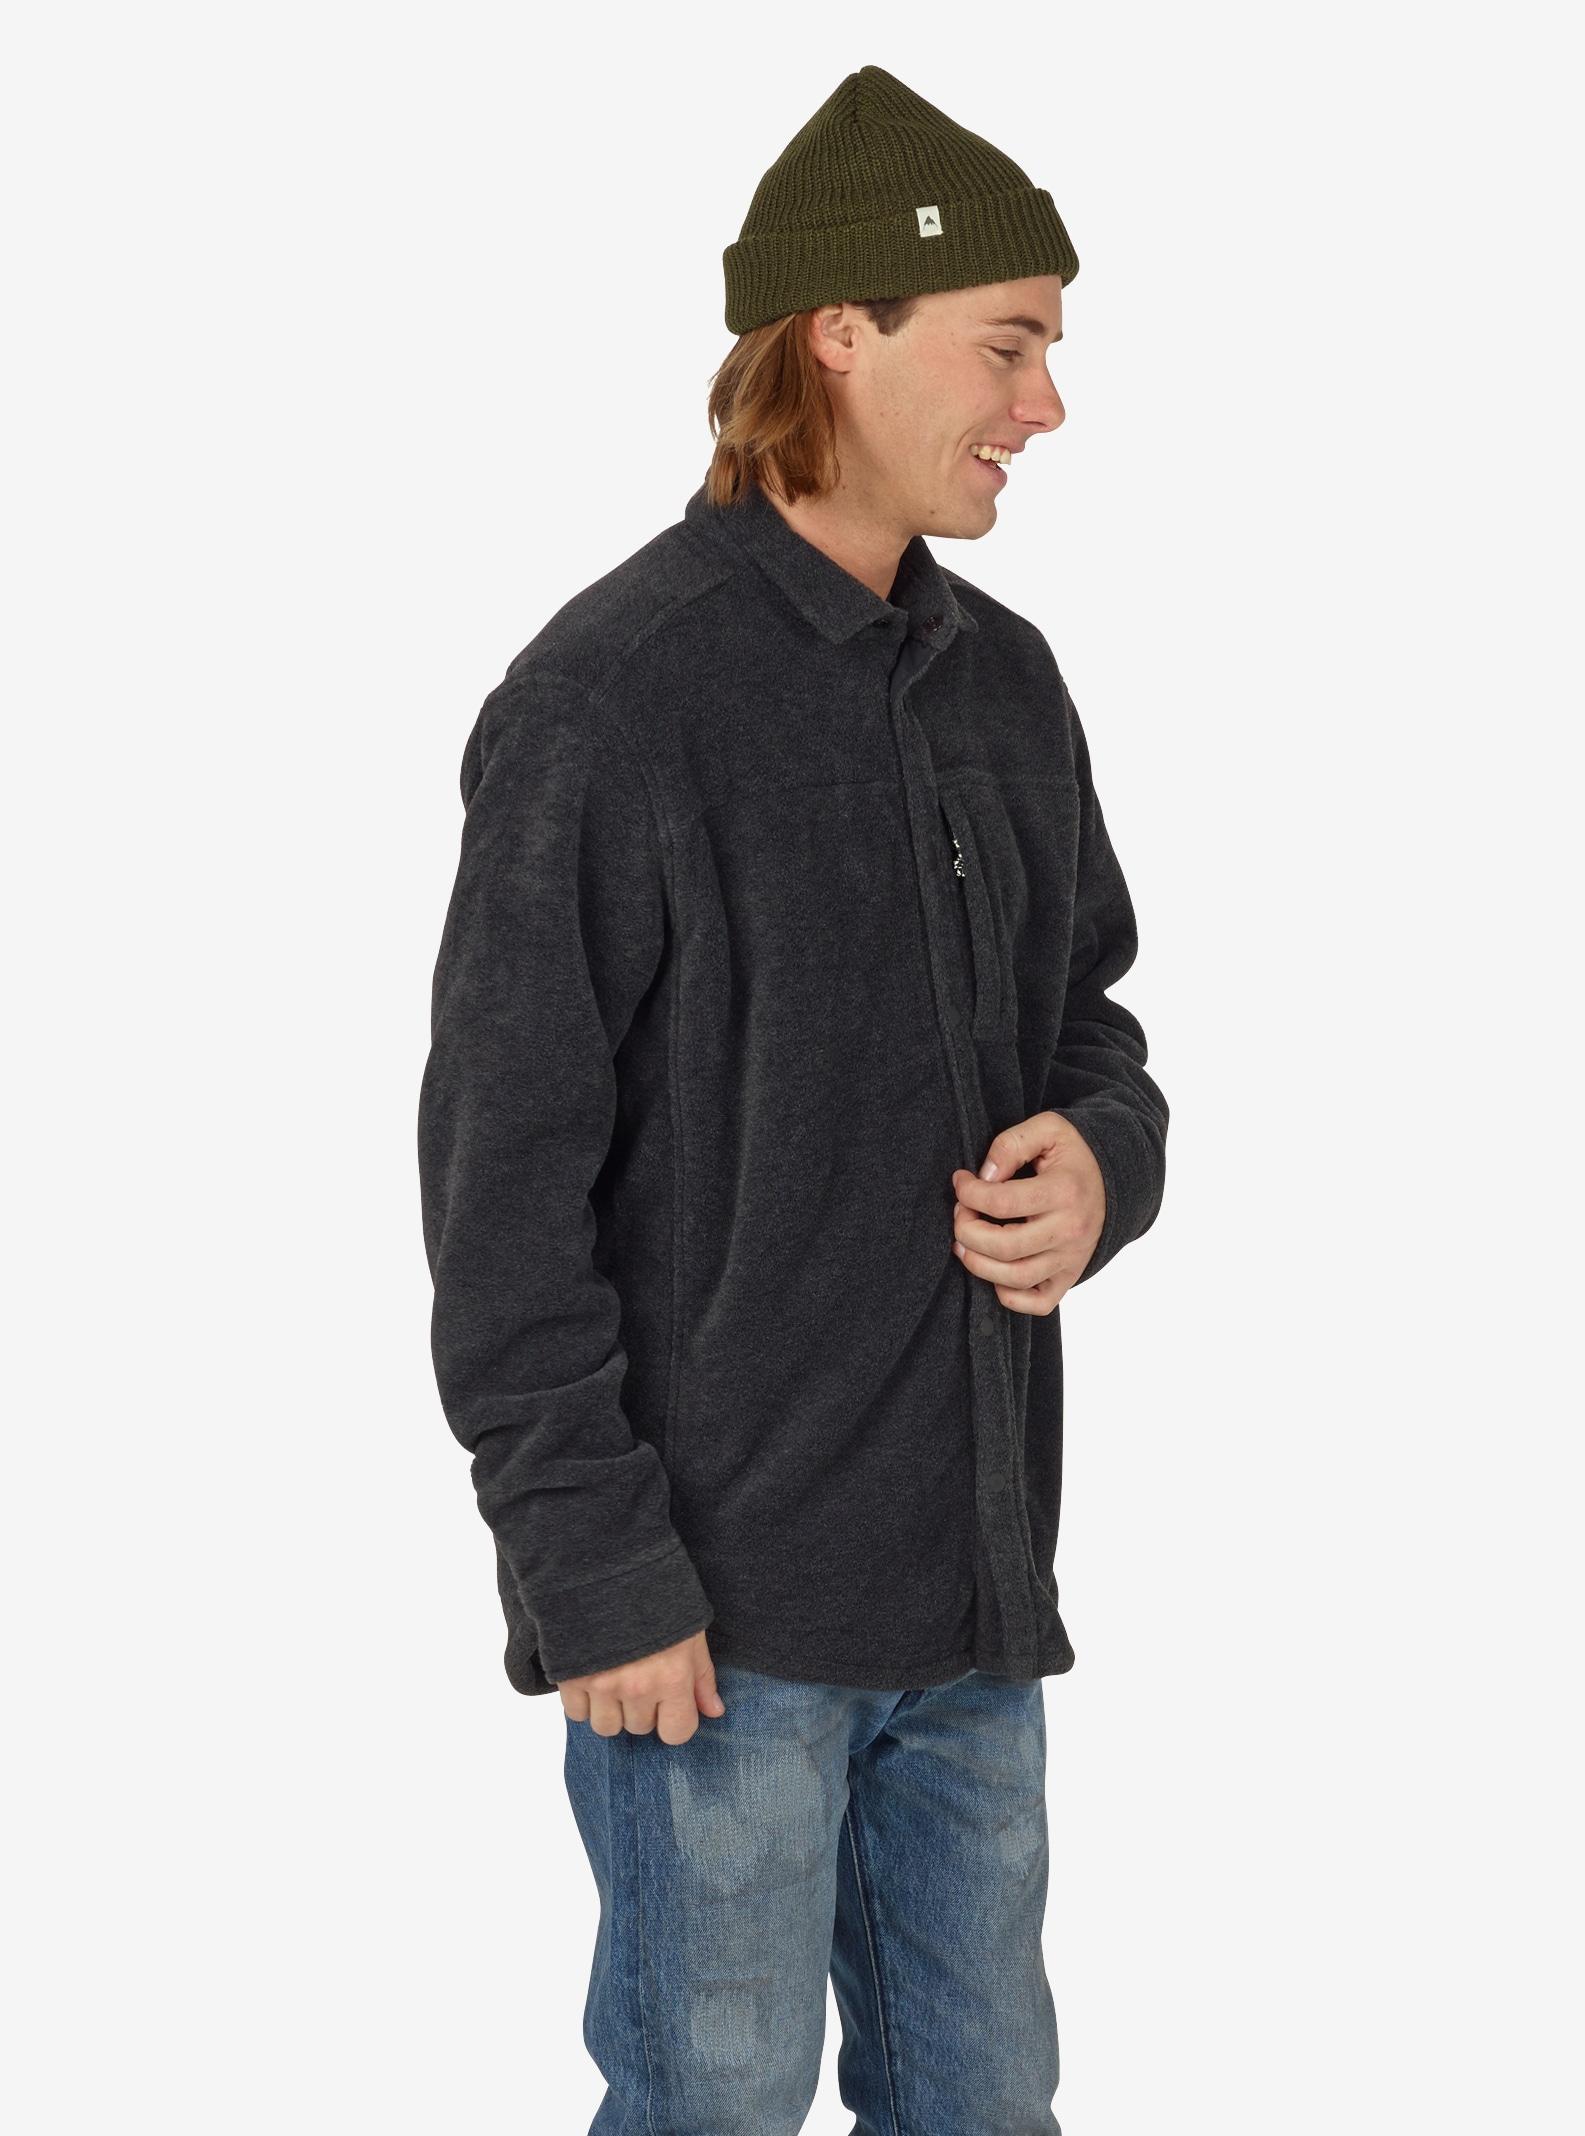 Men's Burton Spillway Fleece Shirt shown in Faded Heather